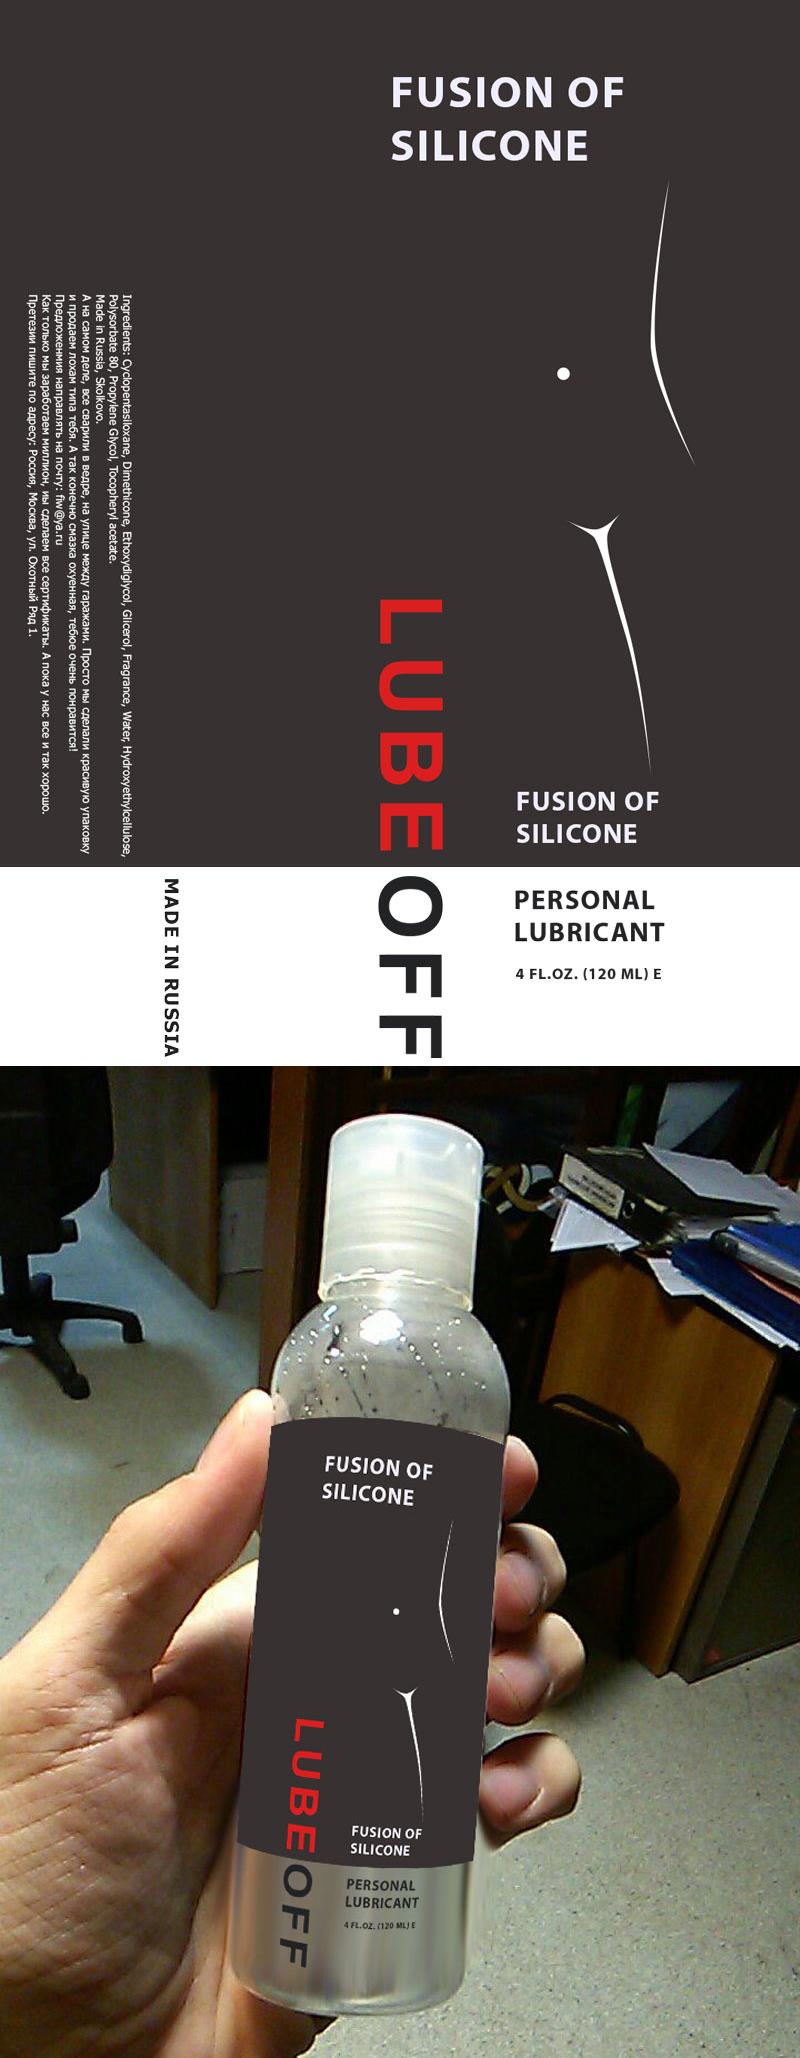 Разработка этикетки интимного геля смазки + брендбук. фото f_9085866c6407fd90.jpg